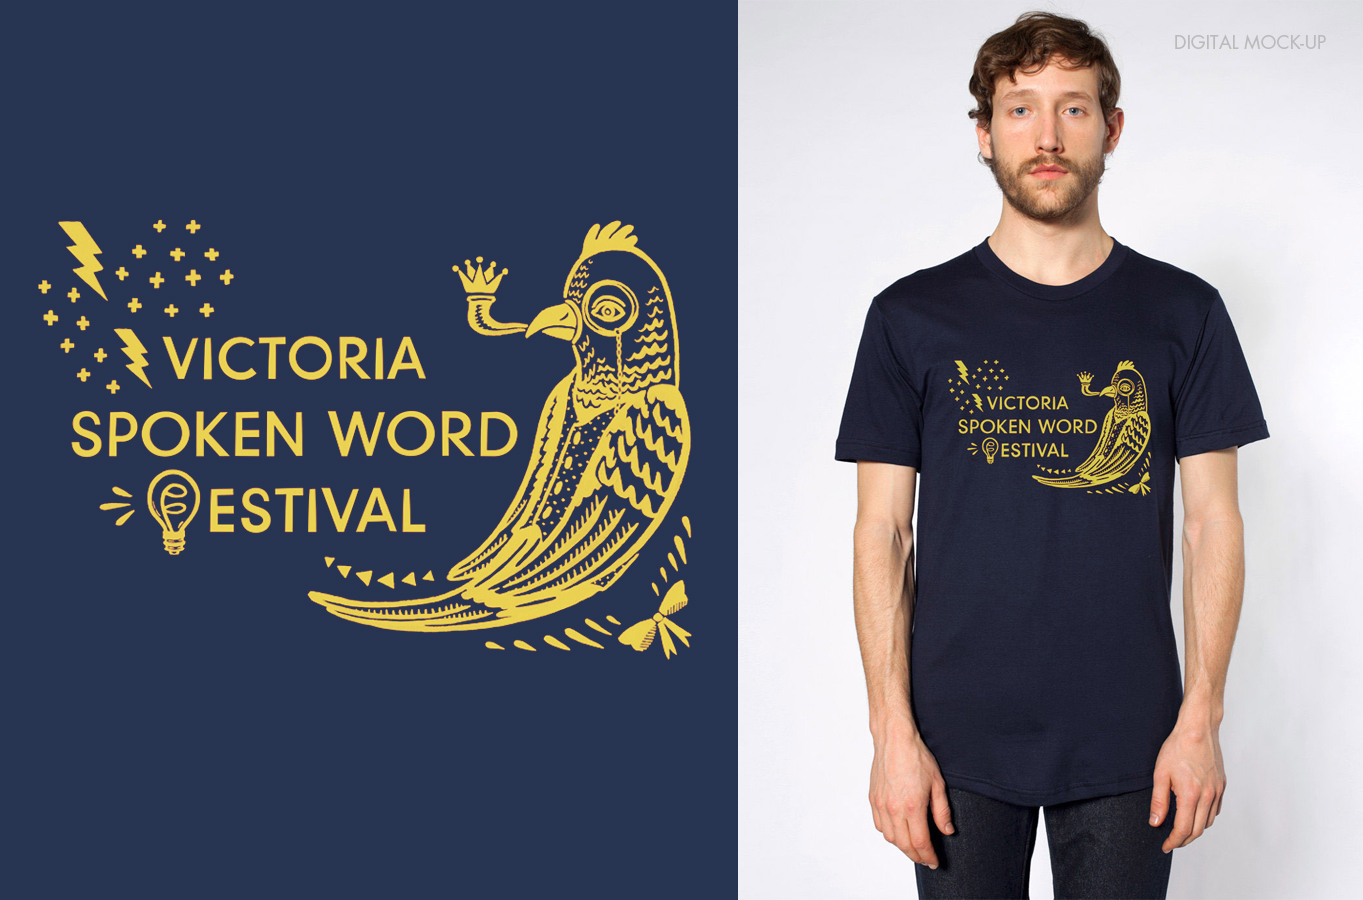 Victoria Spoken Word Festival